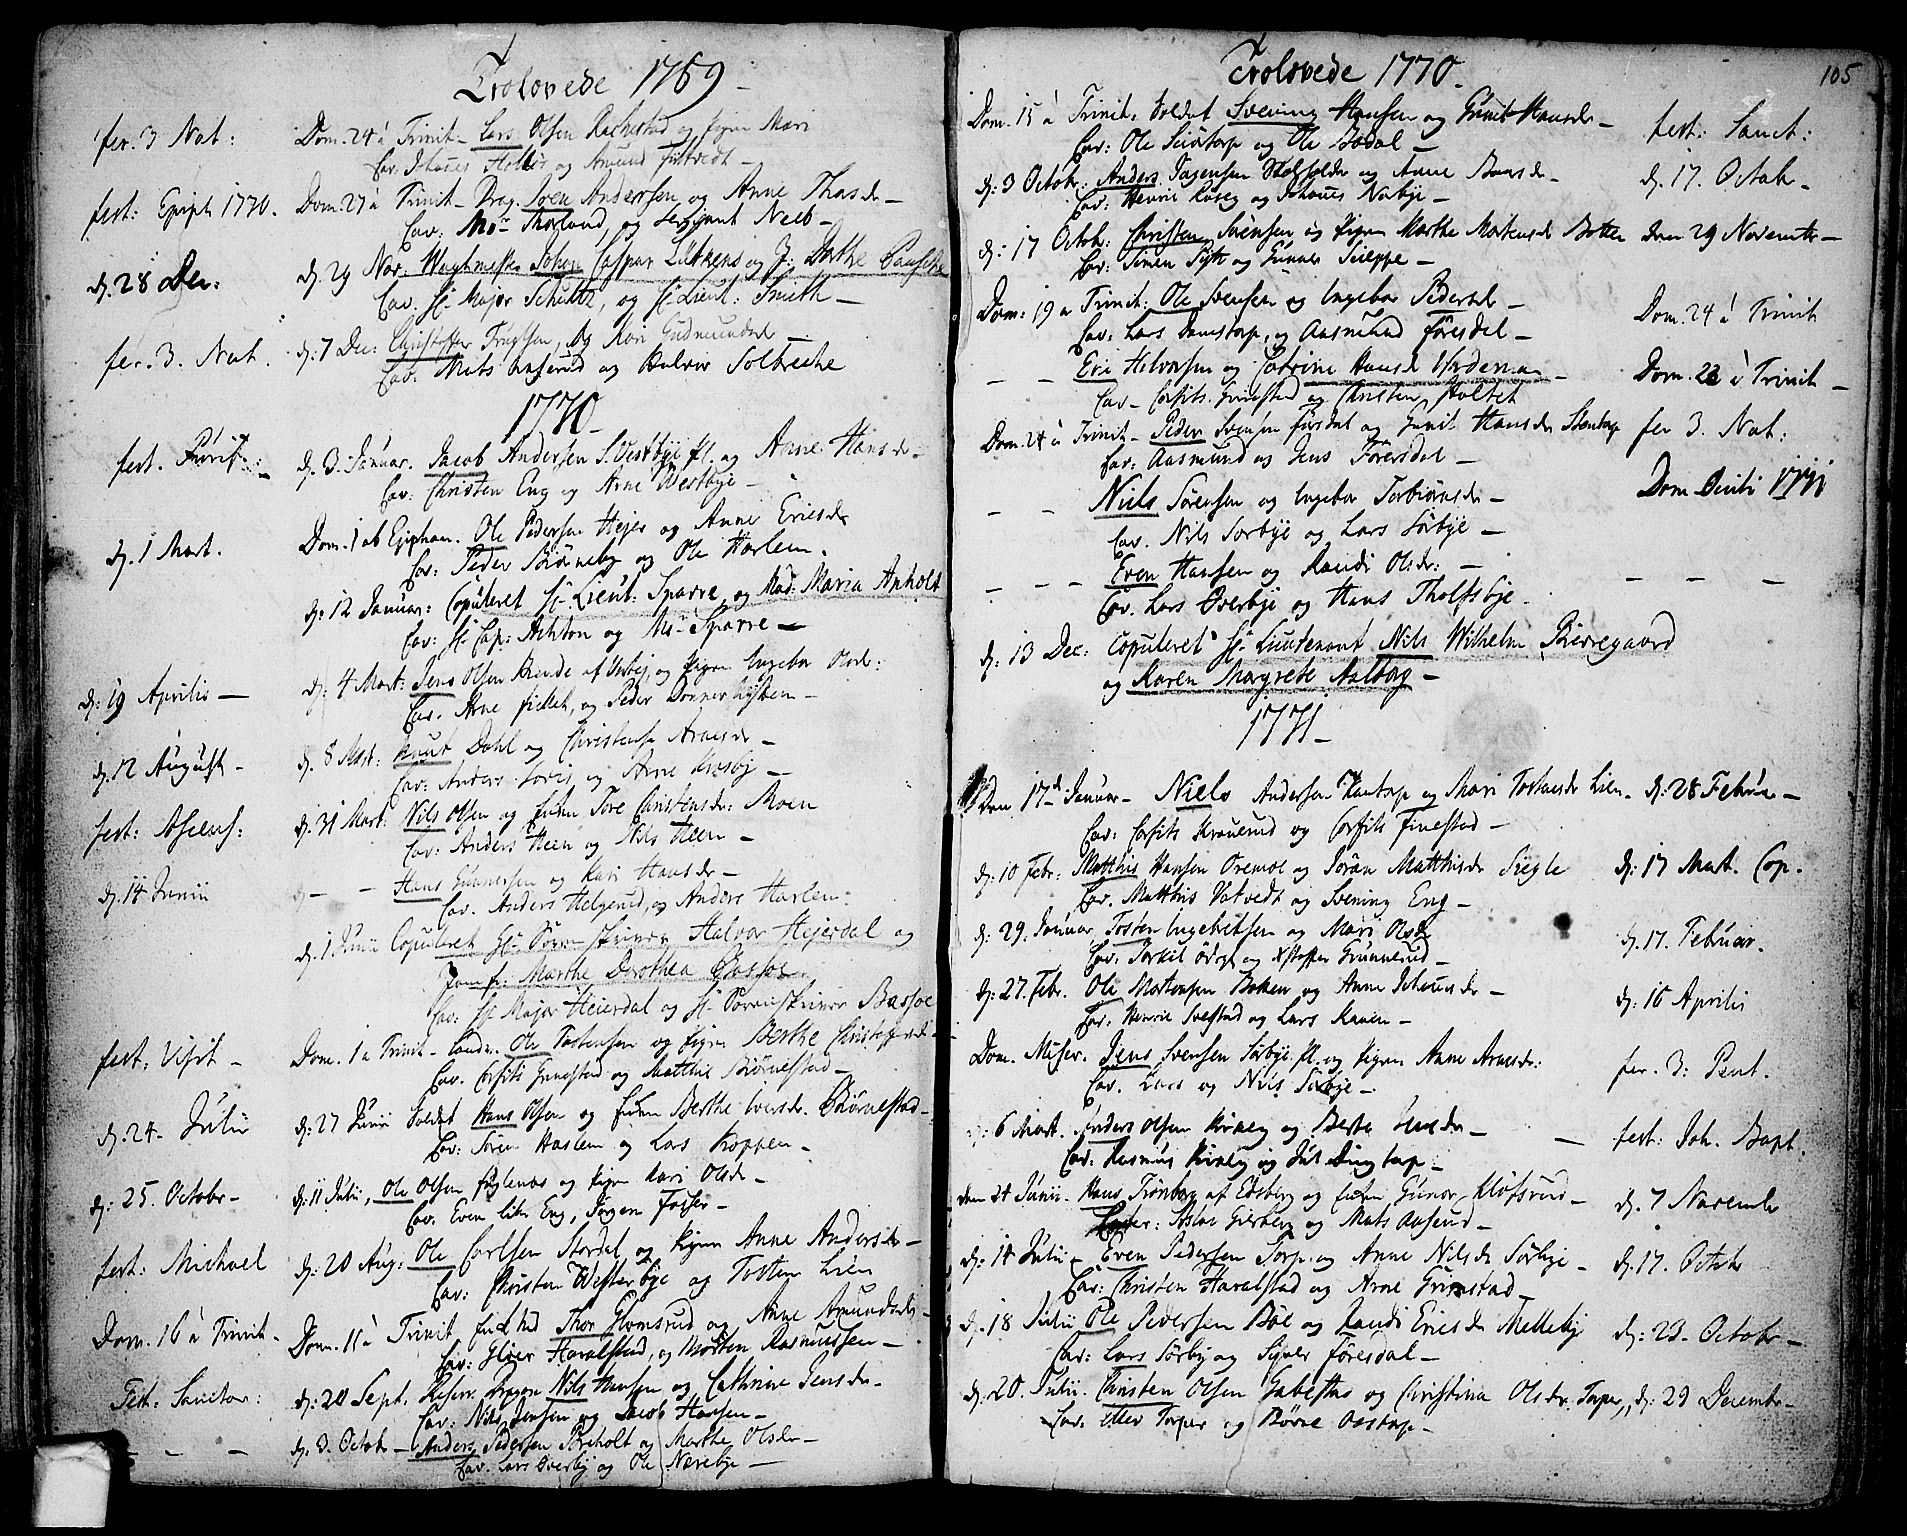 SAO, Rakkestad prestekontor Kirkebøker, F/Fa/L0003: Ministerialbok nr. I 3, 1752-1777, s. 105